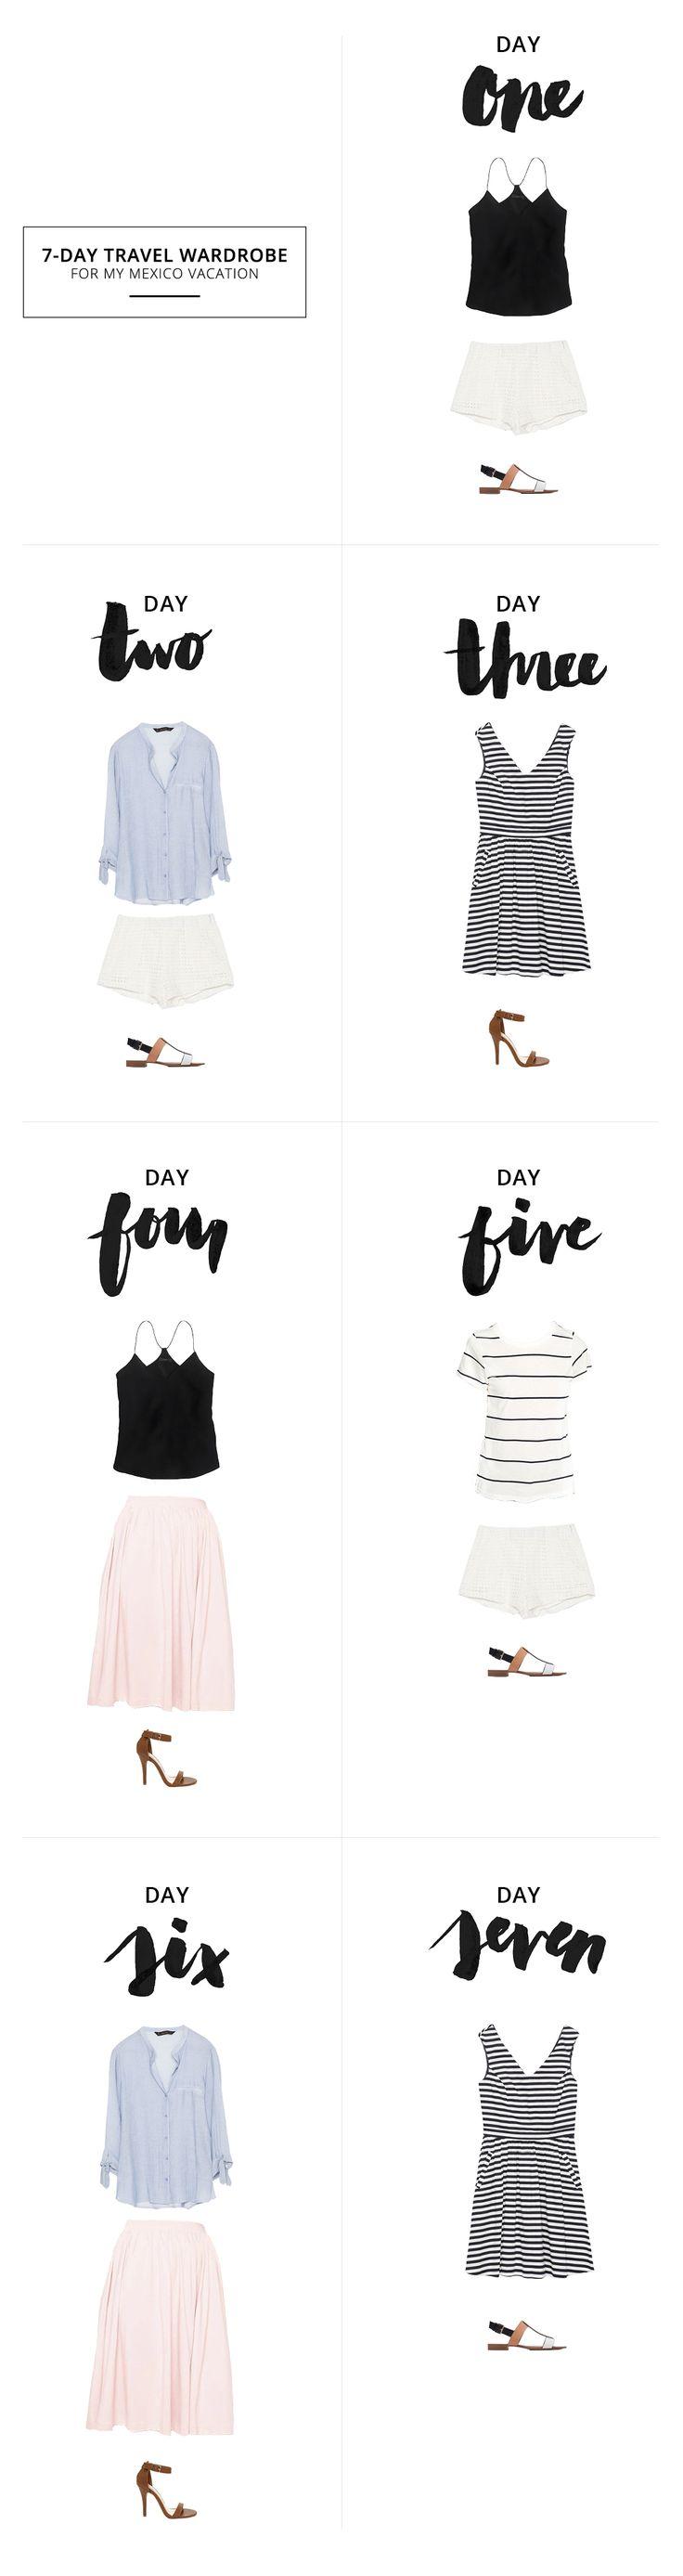 7-Day Travel Wardrobe // Creating a capsule holiday wardrobe | see, love, covet